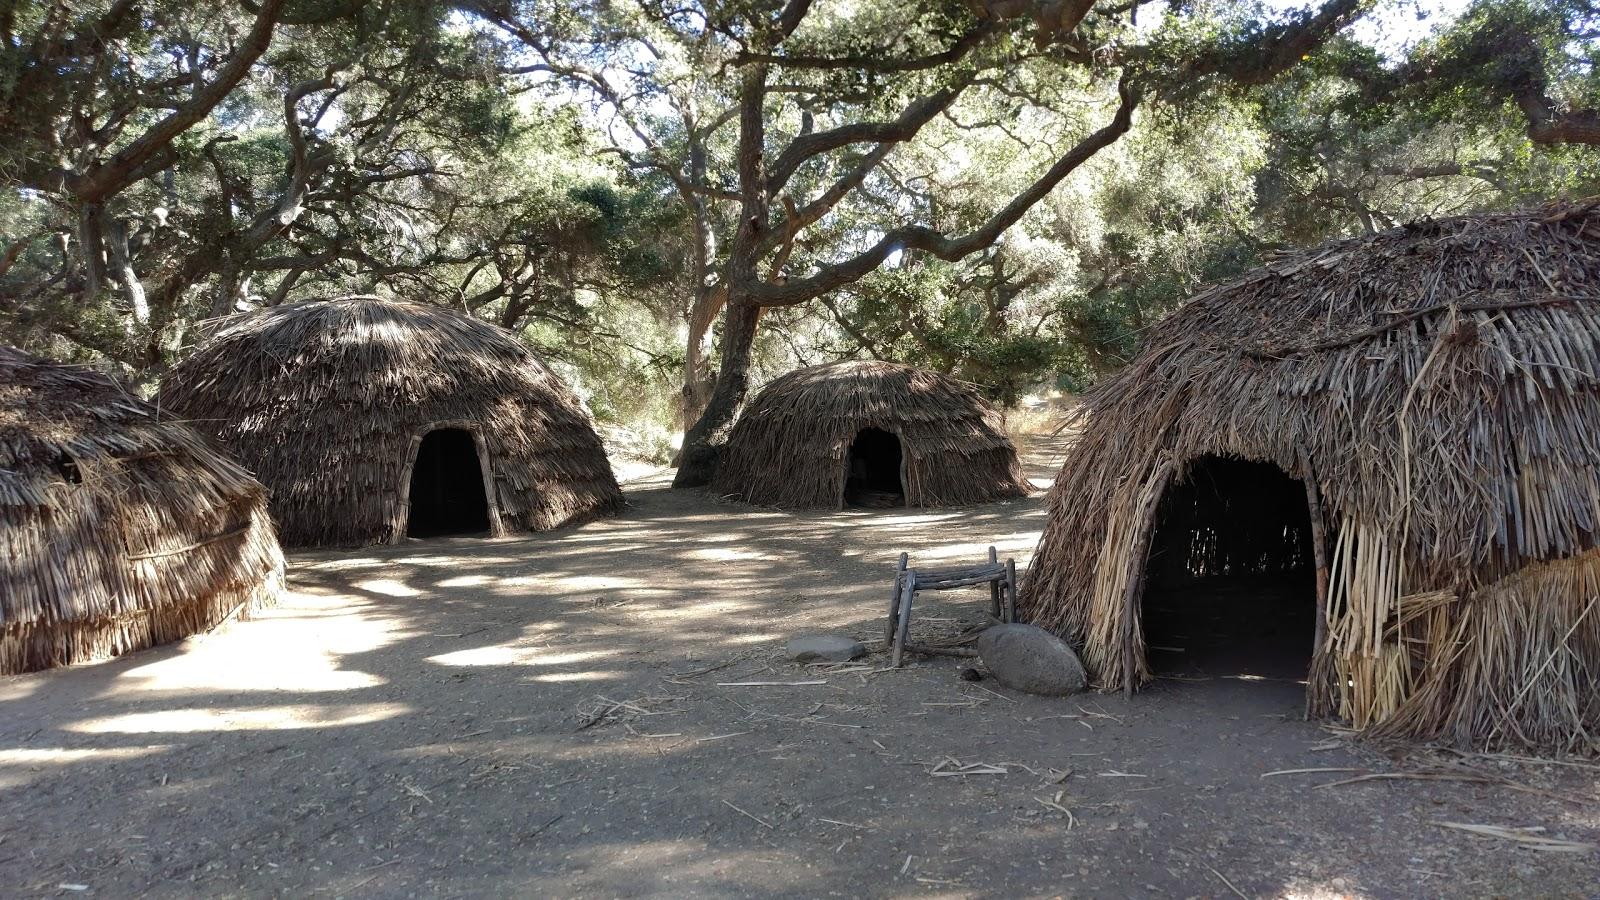 Chumash Indian Museum - Visit Ventura